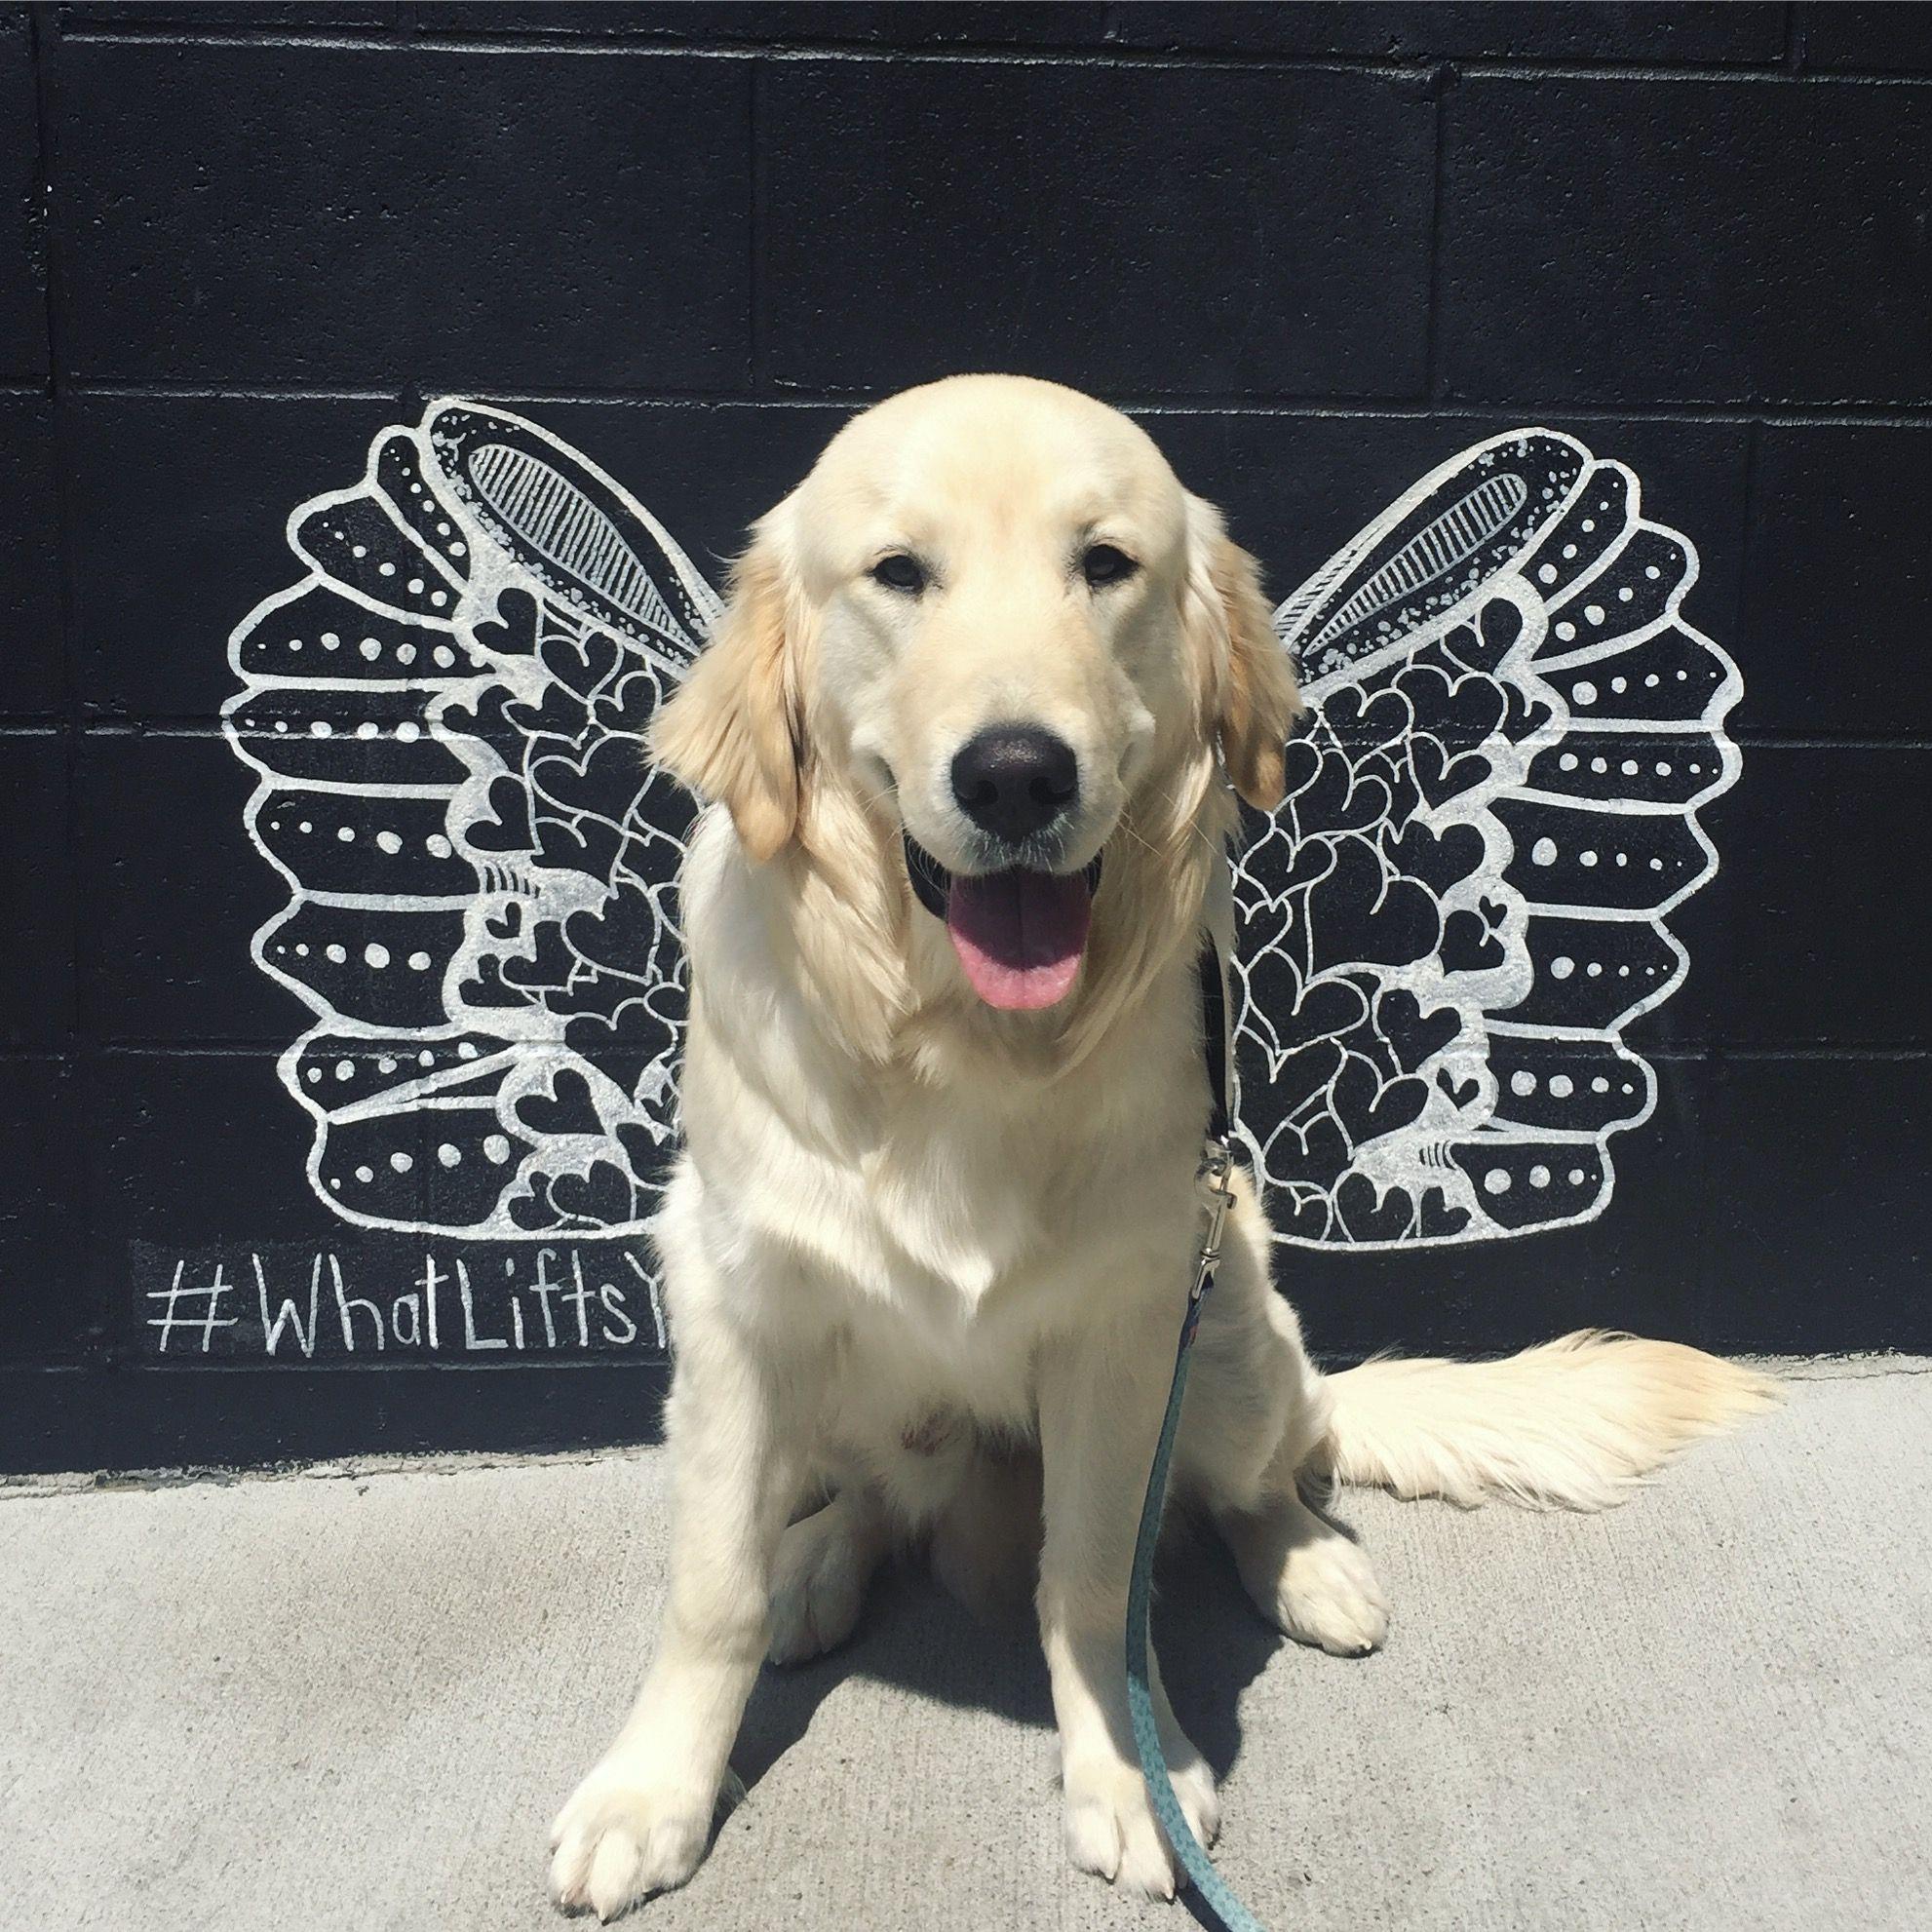 Golden Retriever Puppy Nashville Murals The Gulch What Lifts You Golden Retriever Dogs Golden Retriever Golden Retriever Puppy